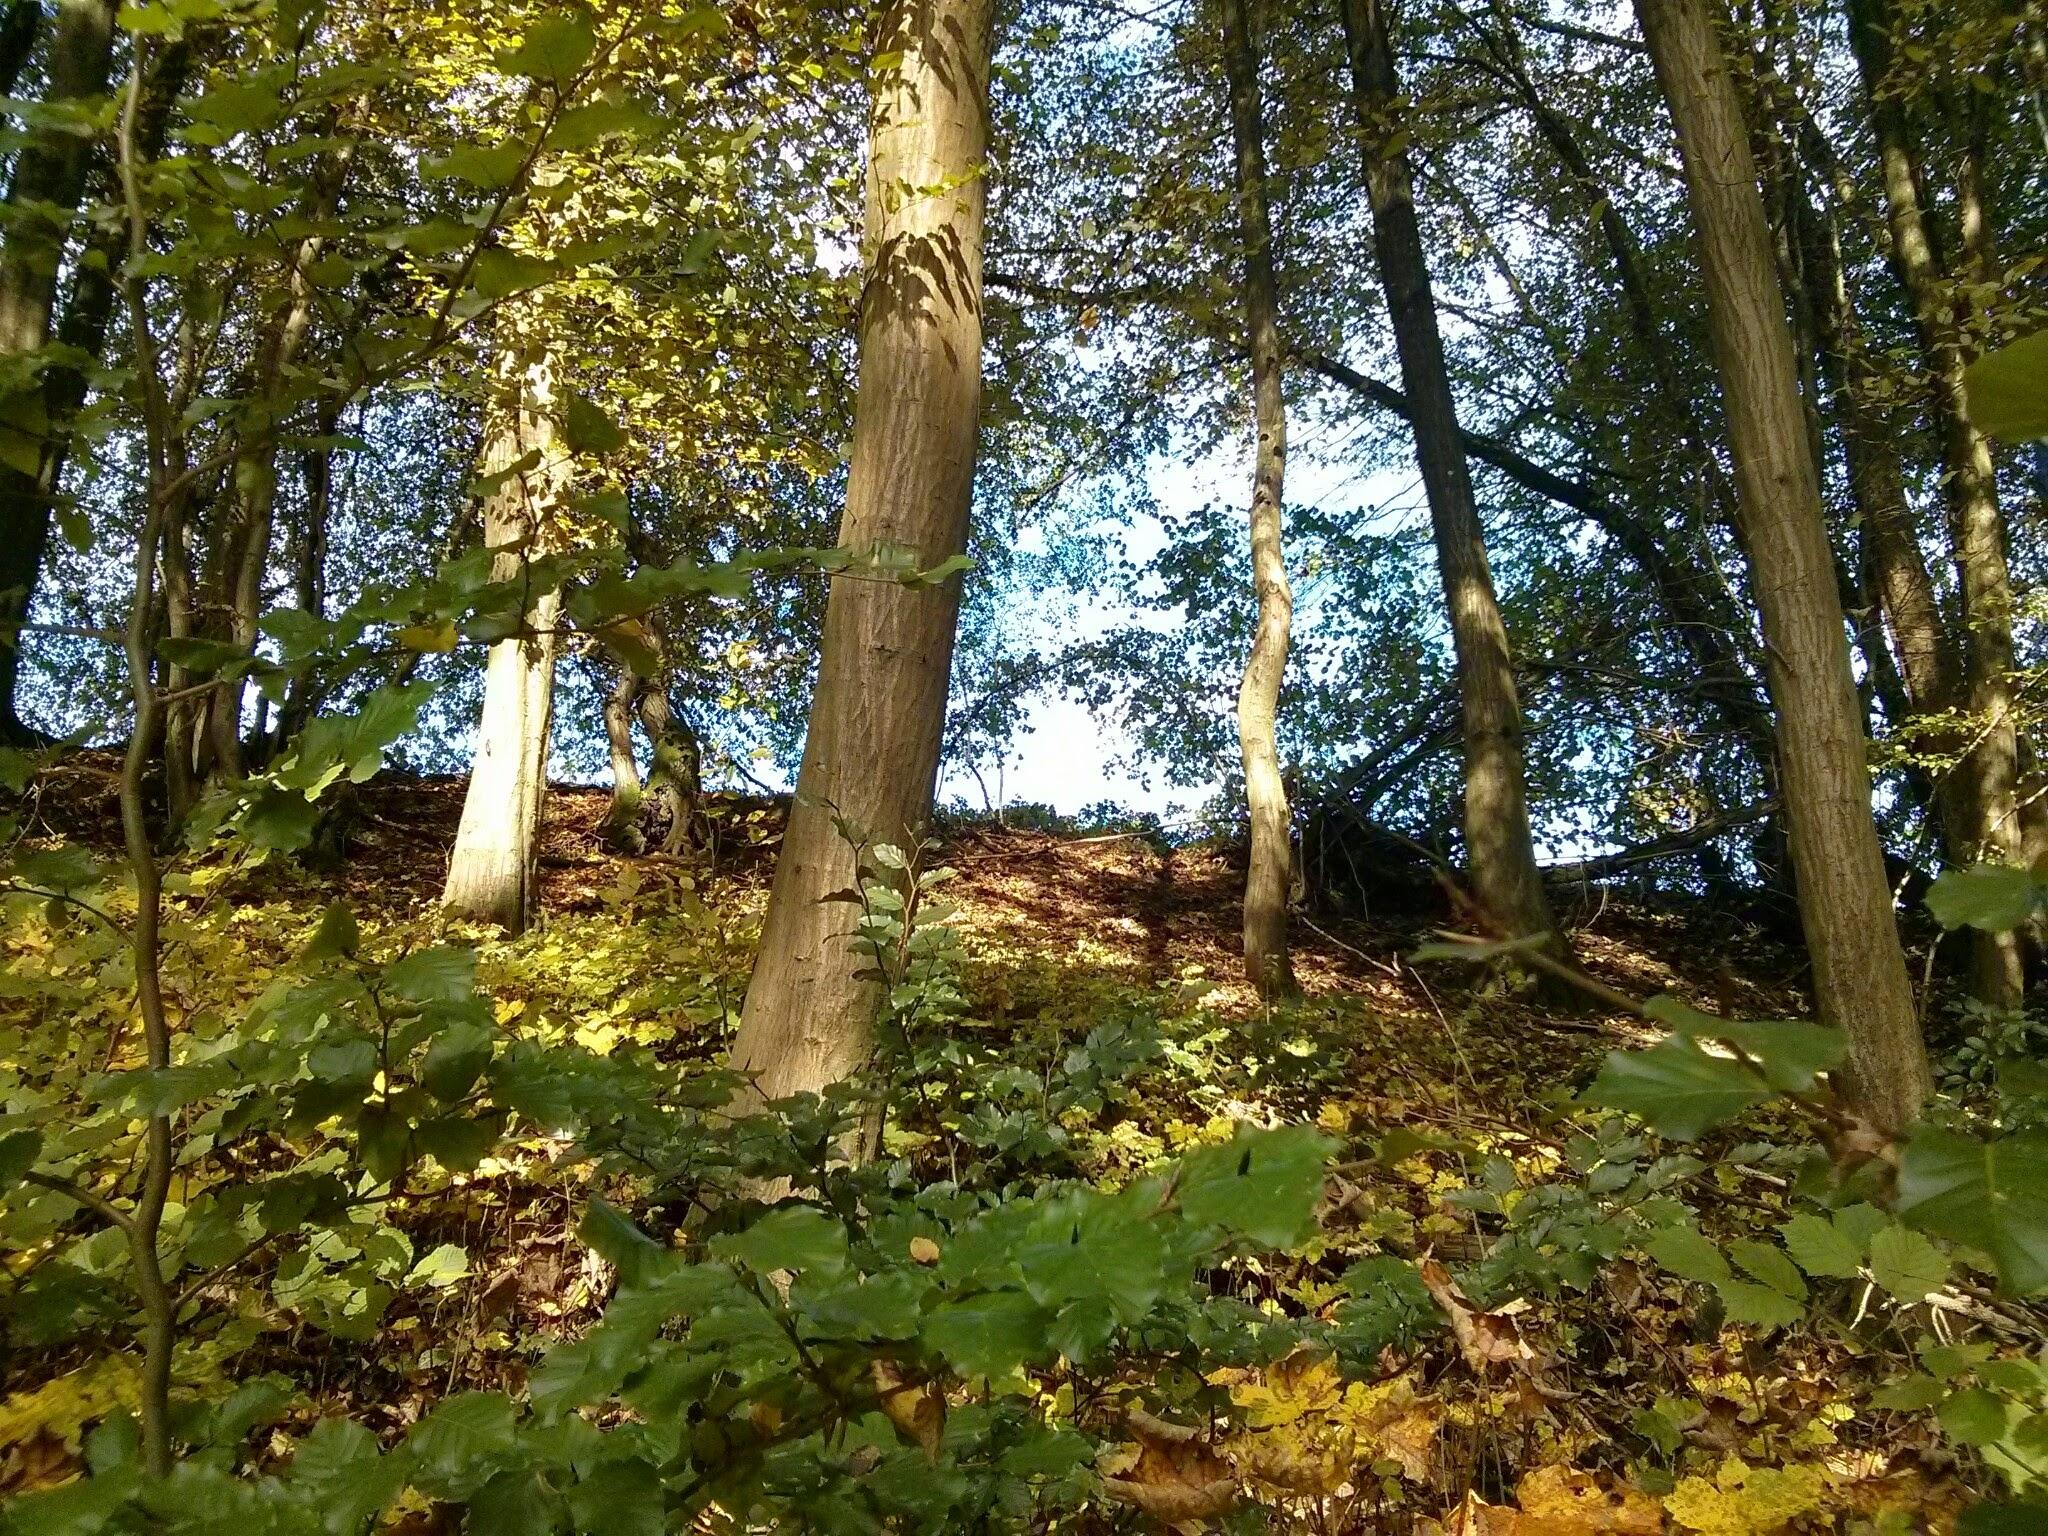 Herbstwald Saarland 2014 © Cora Berger